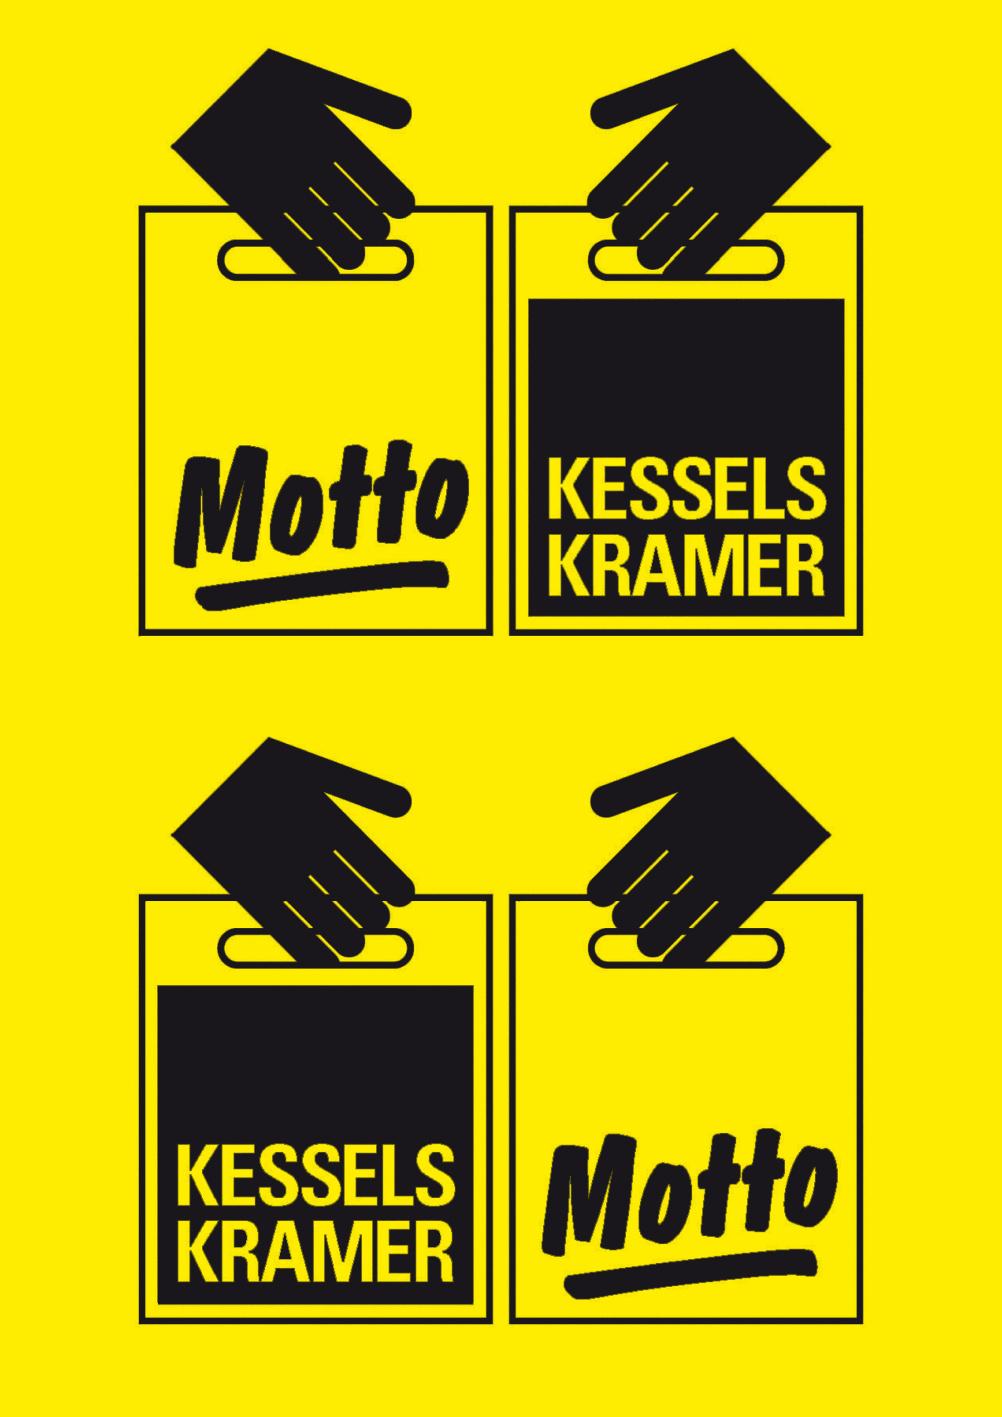 Motto x KesselsKramer